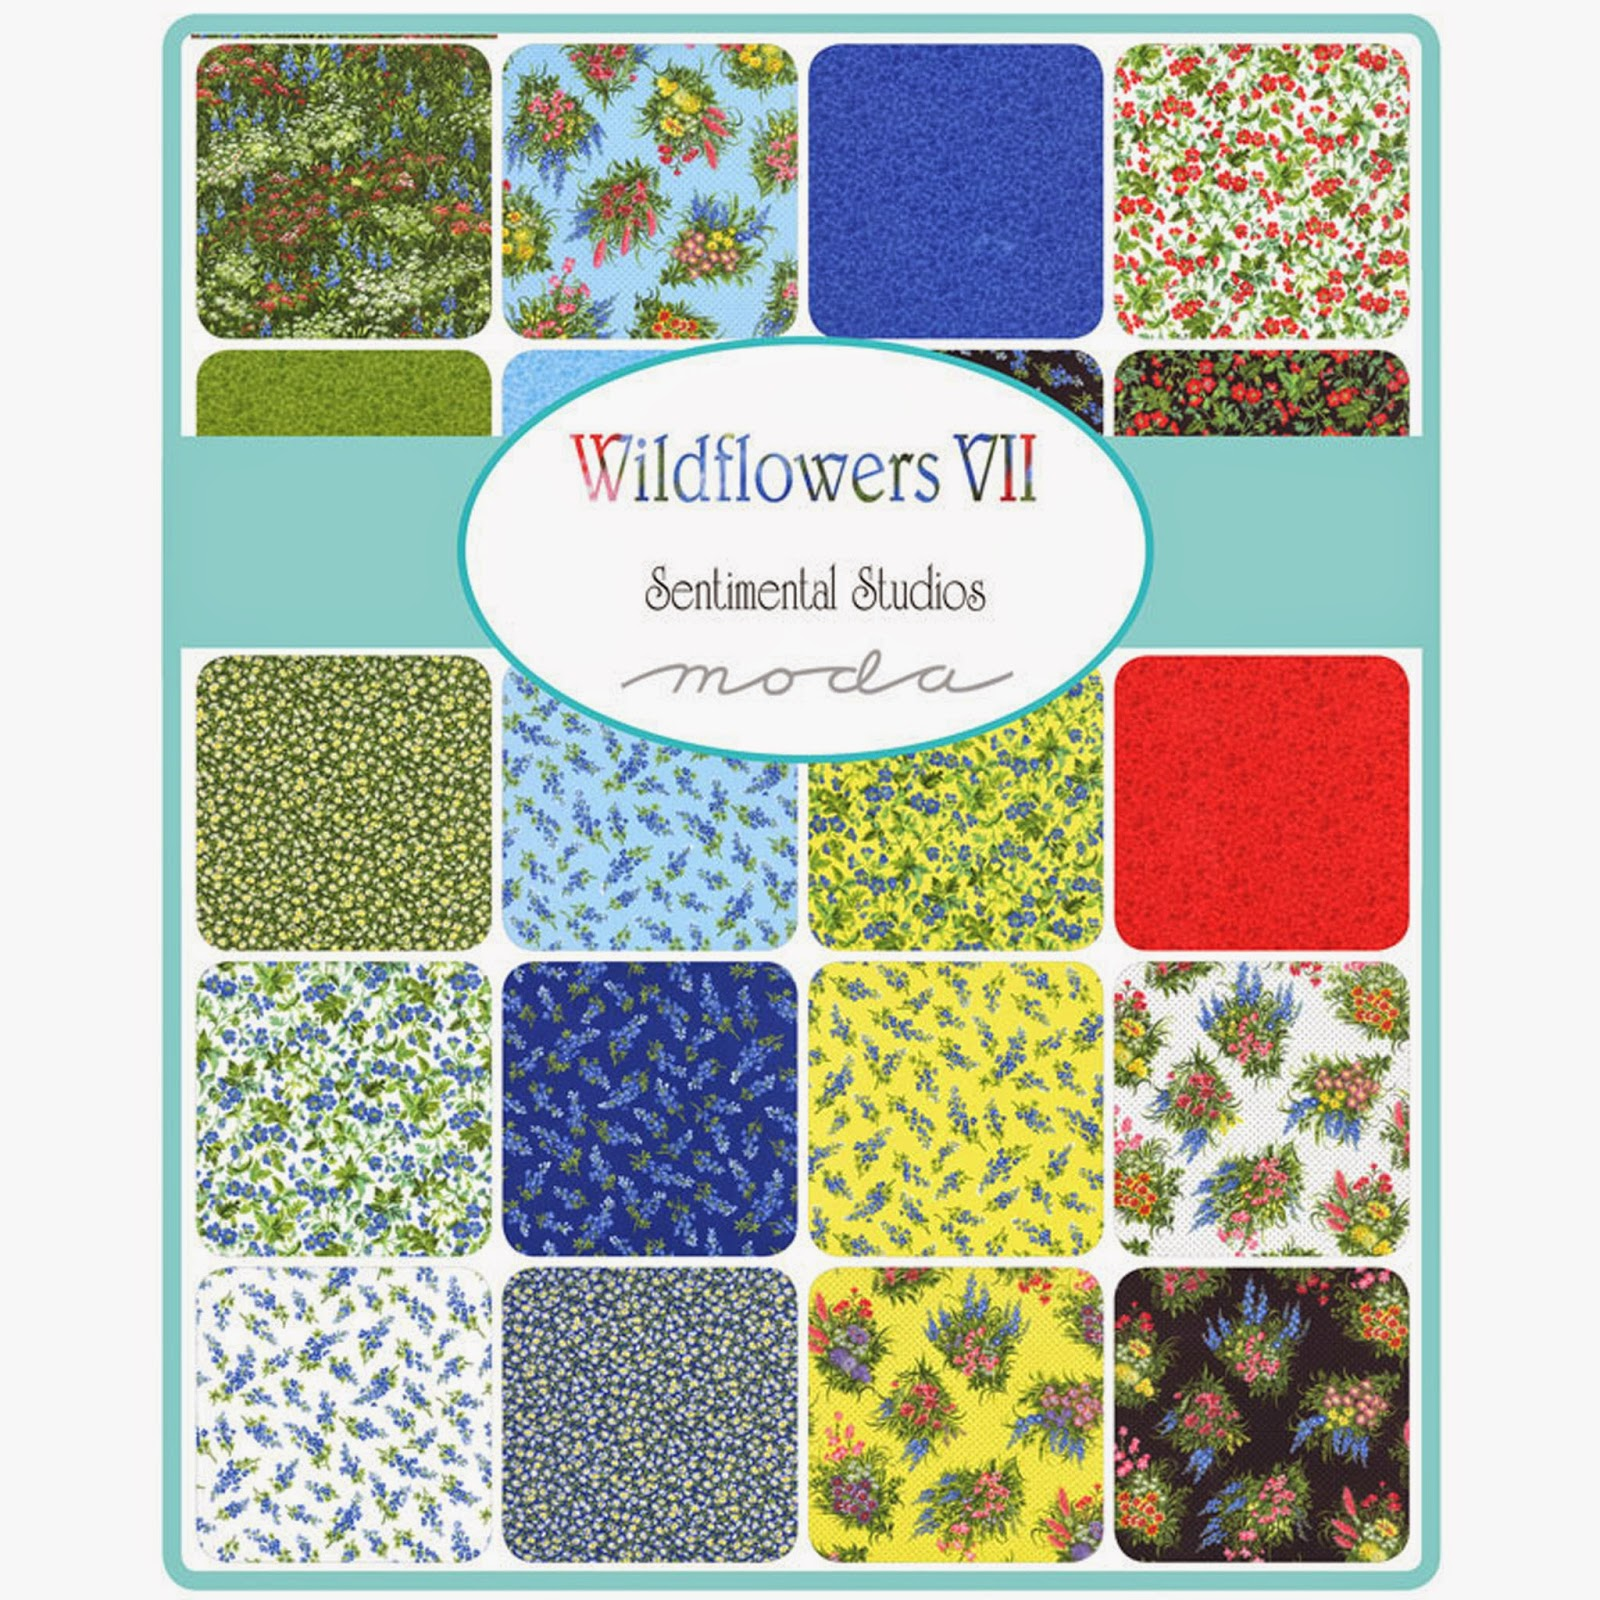 Moda WILDFLOWERS VII Fabric by Sentimental Studios for Moda Fabrics